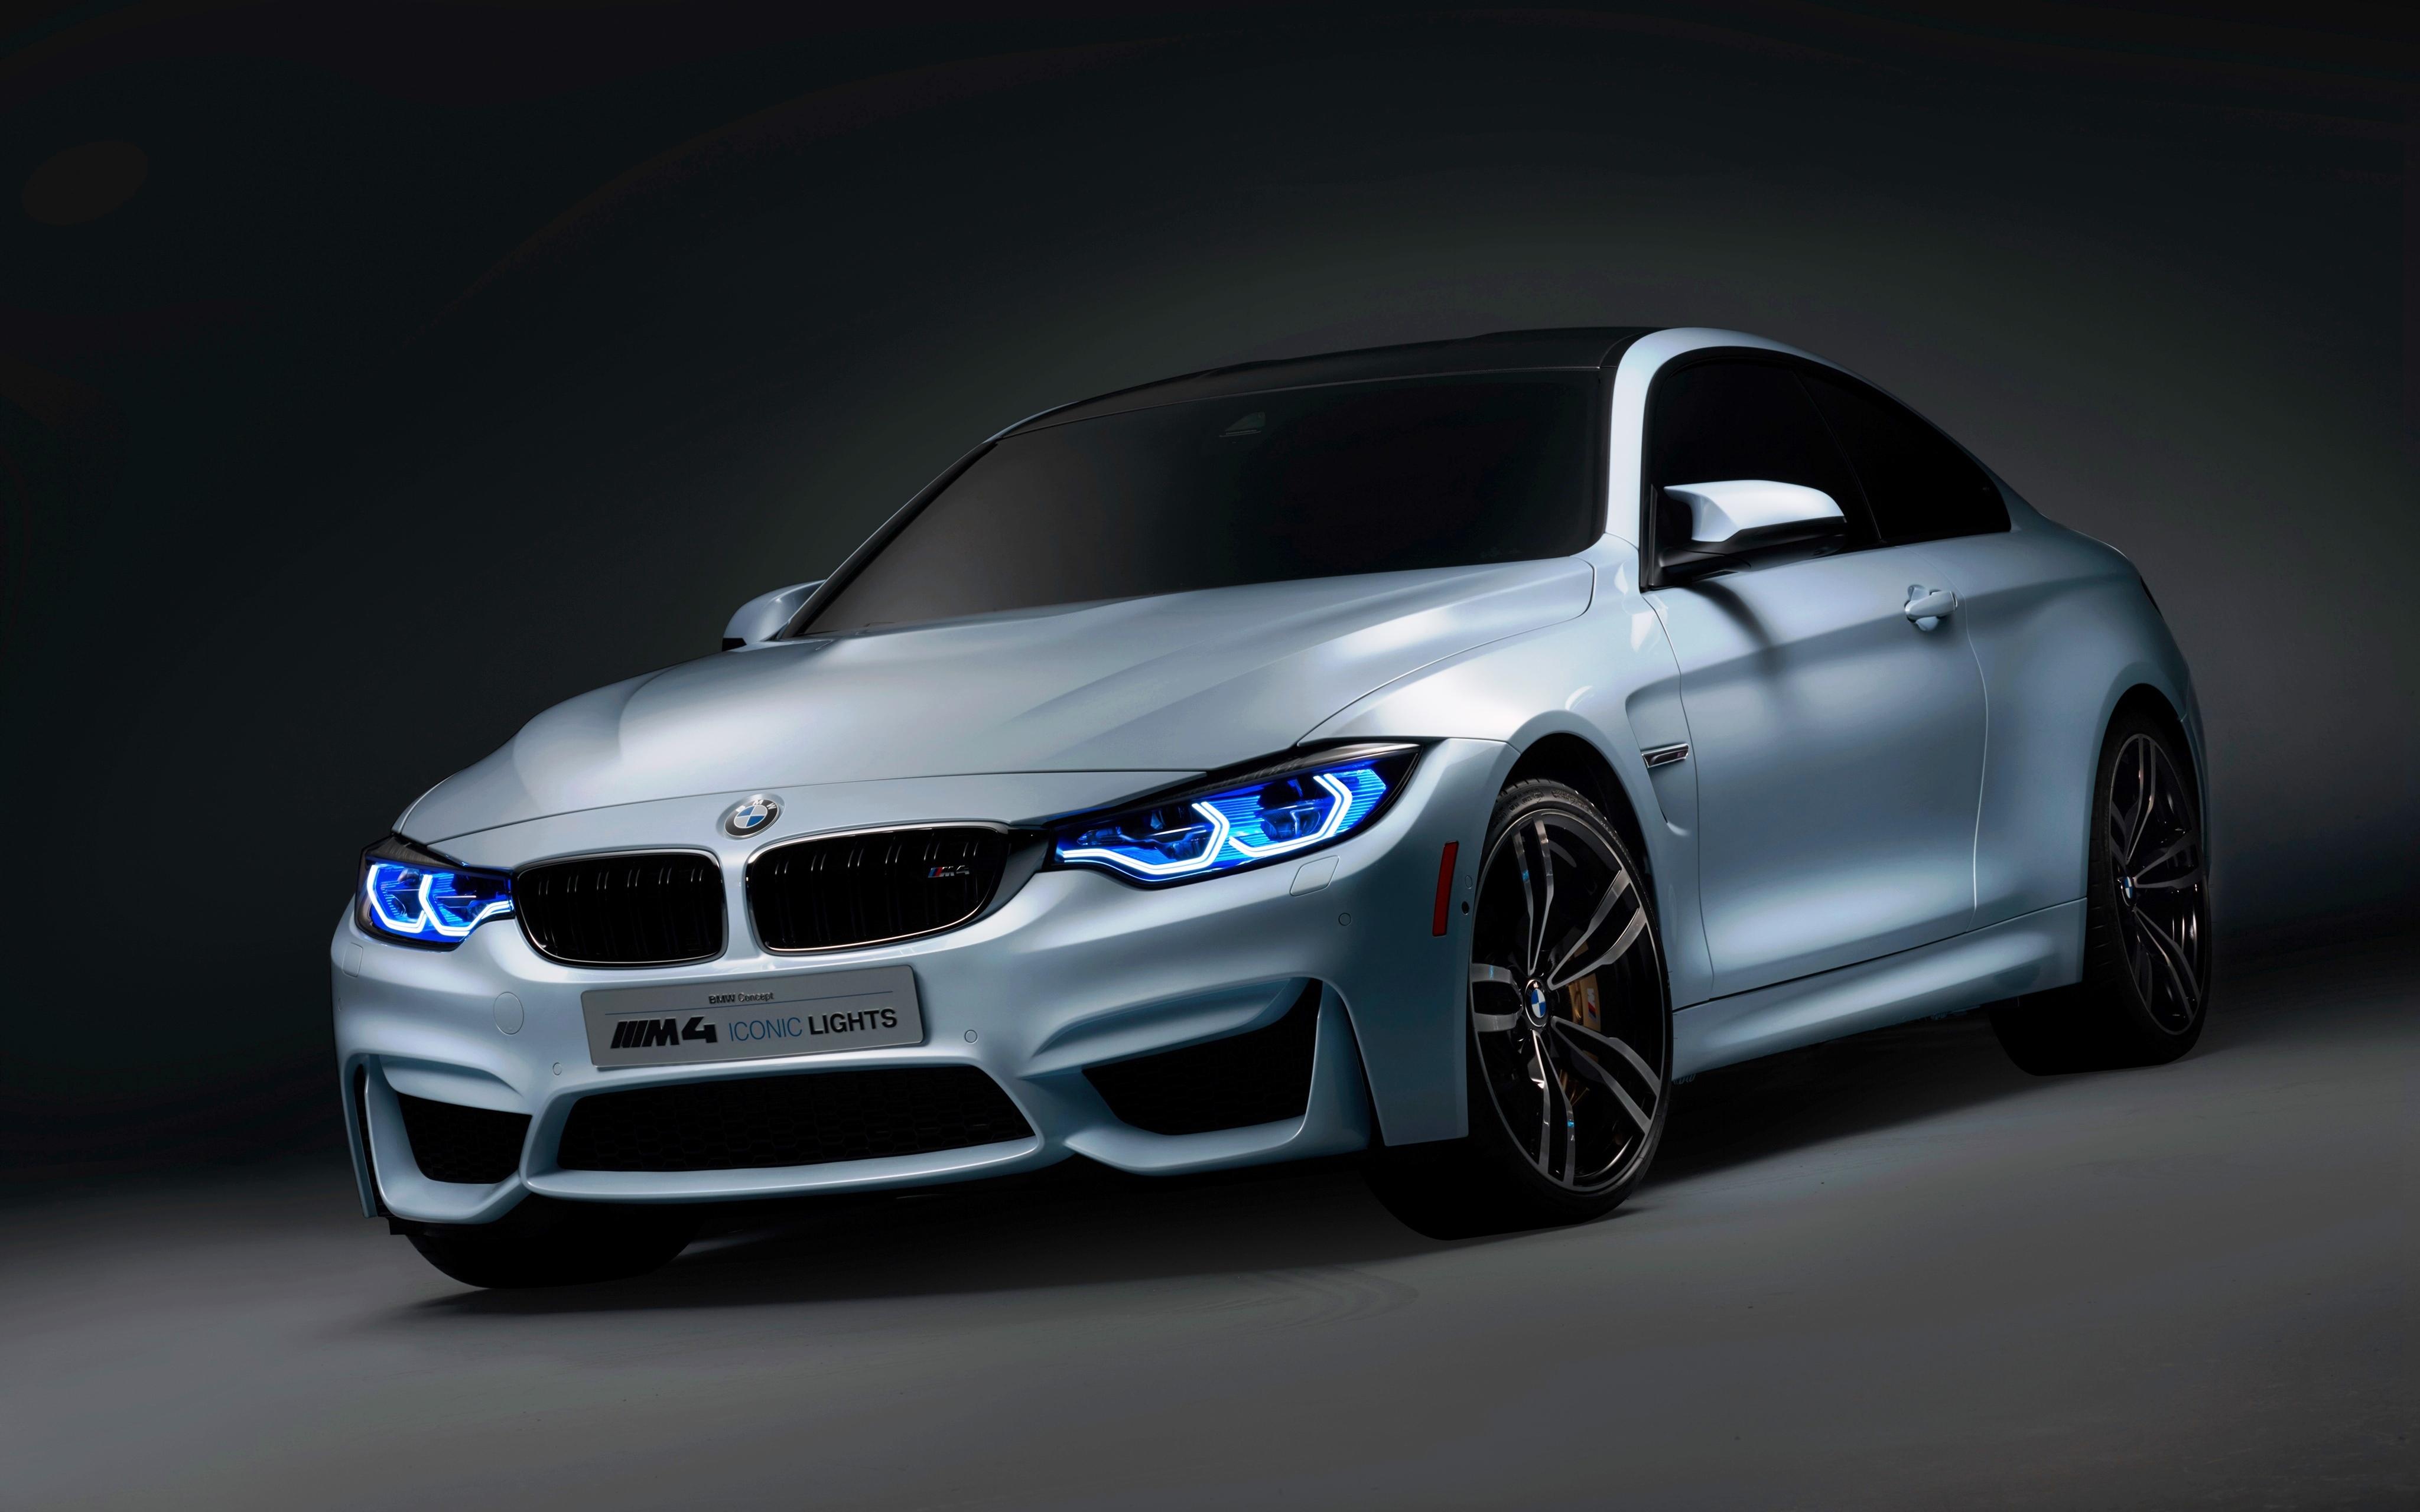 BMW M4 4k Ultra HD Wallpaper | Background Image ...